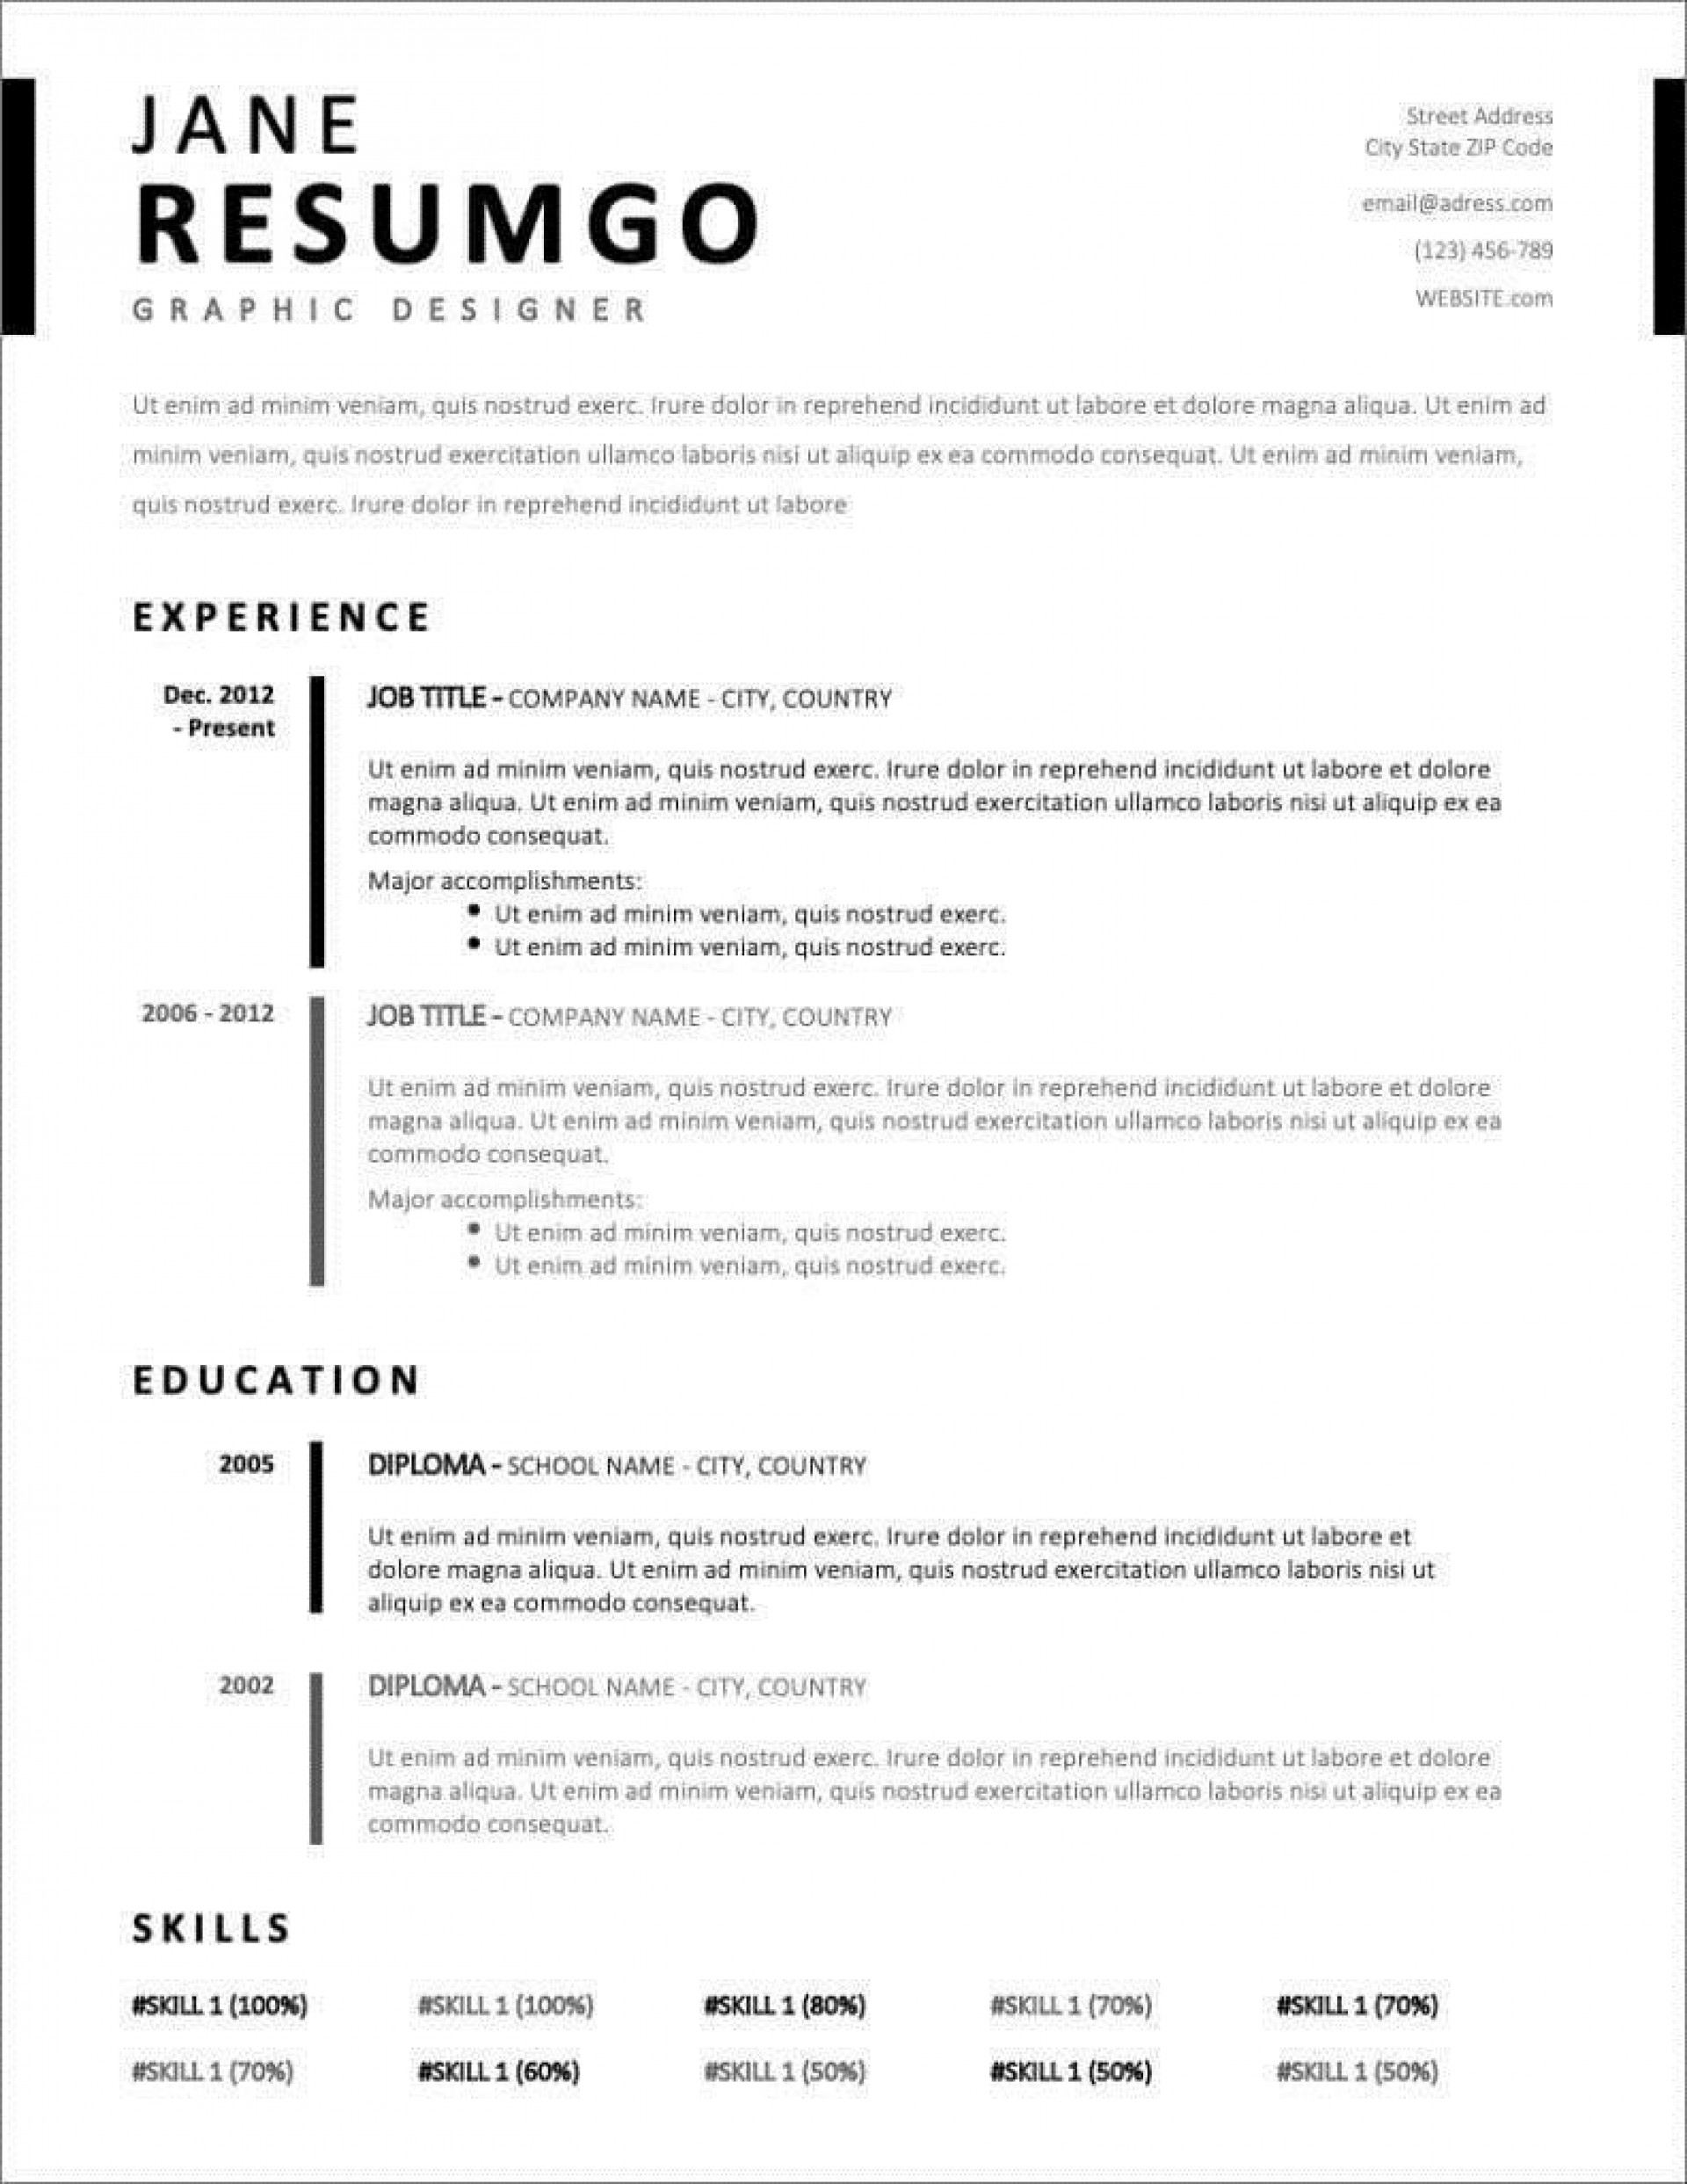 005 Surprising Resume Template For Free Photo  Best Word Freelance Writer Microsoft1920